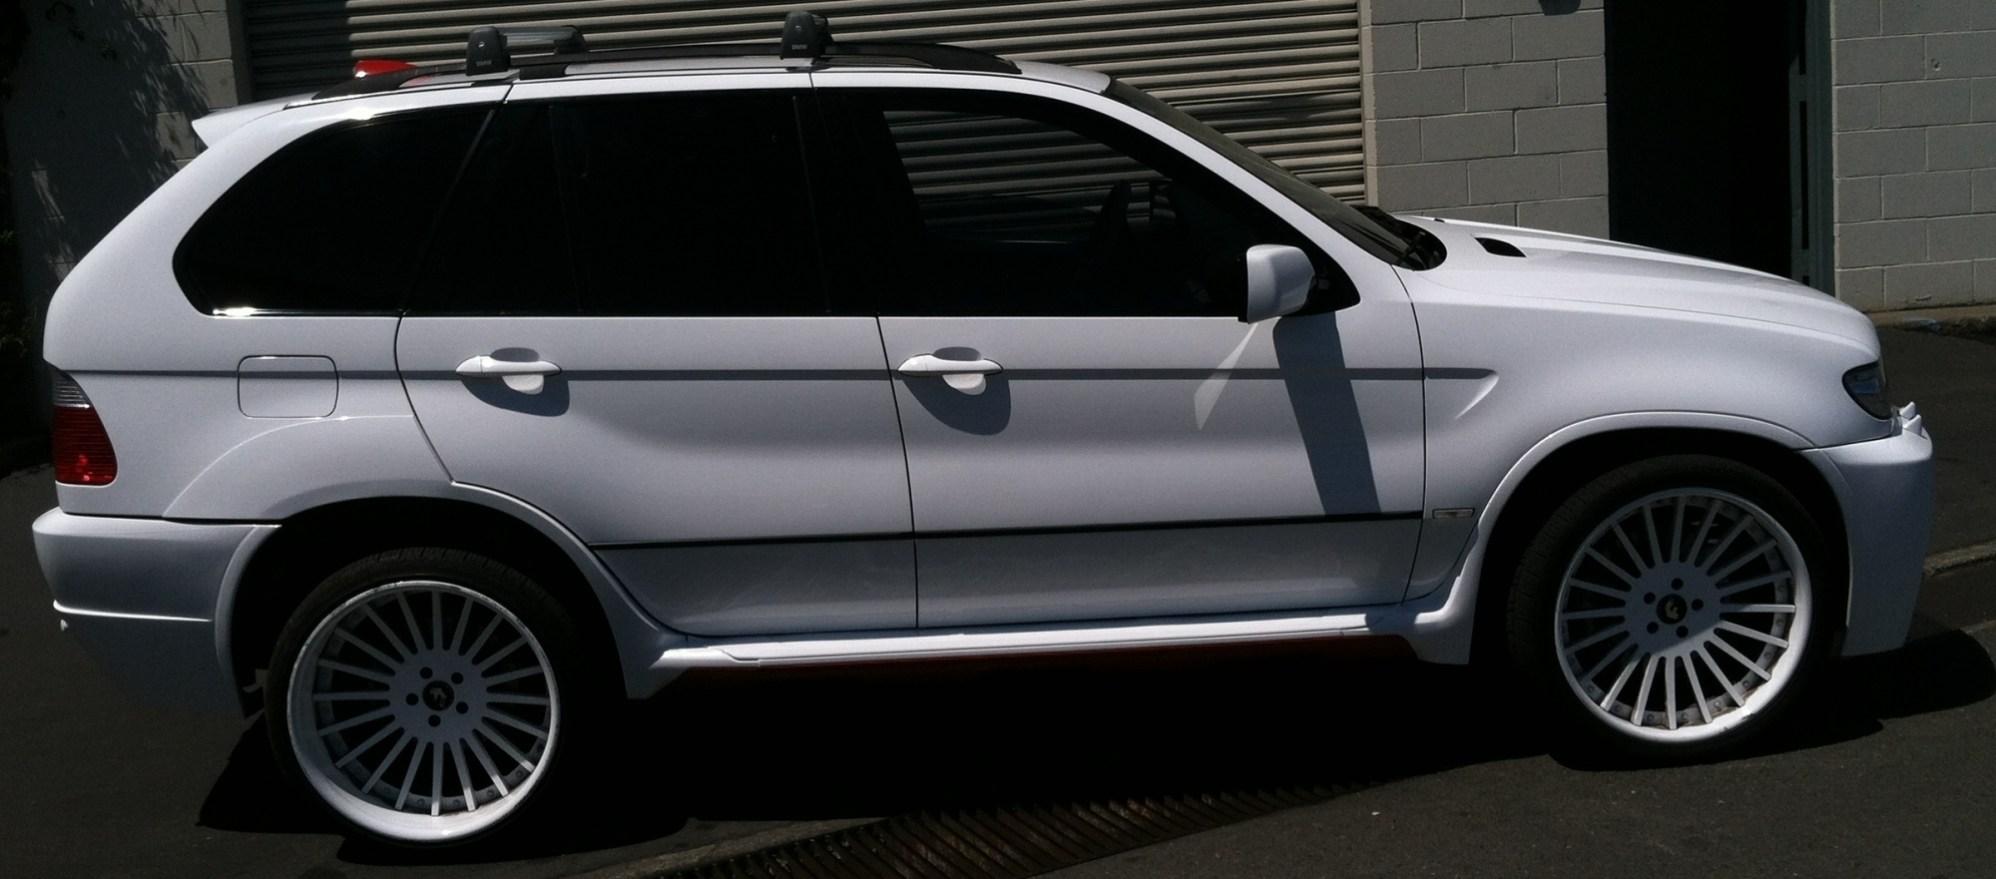 BMW Suv Color Change Wrap-25